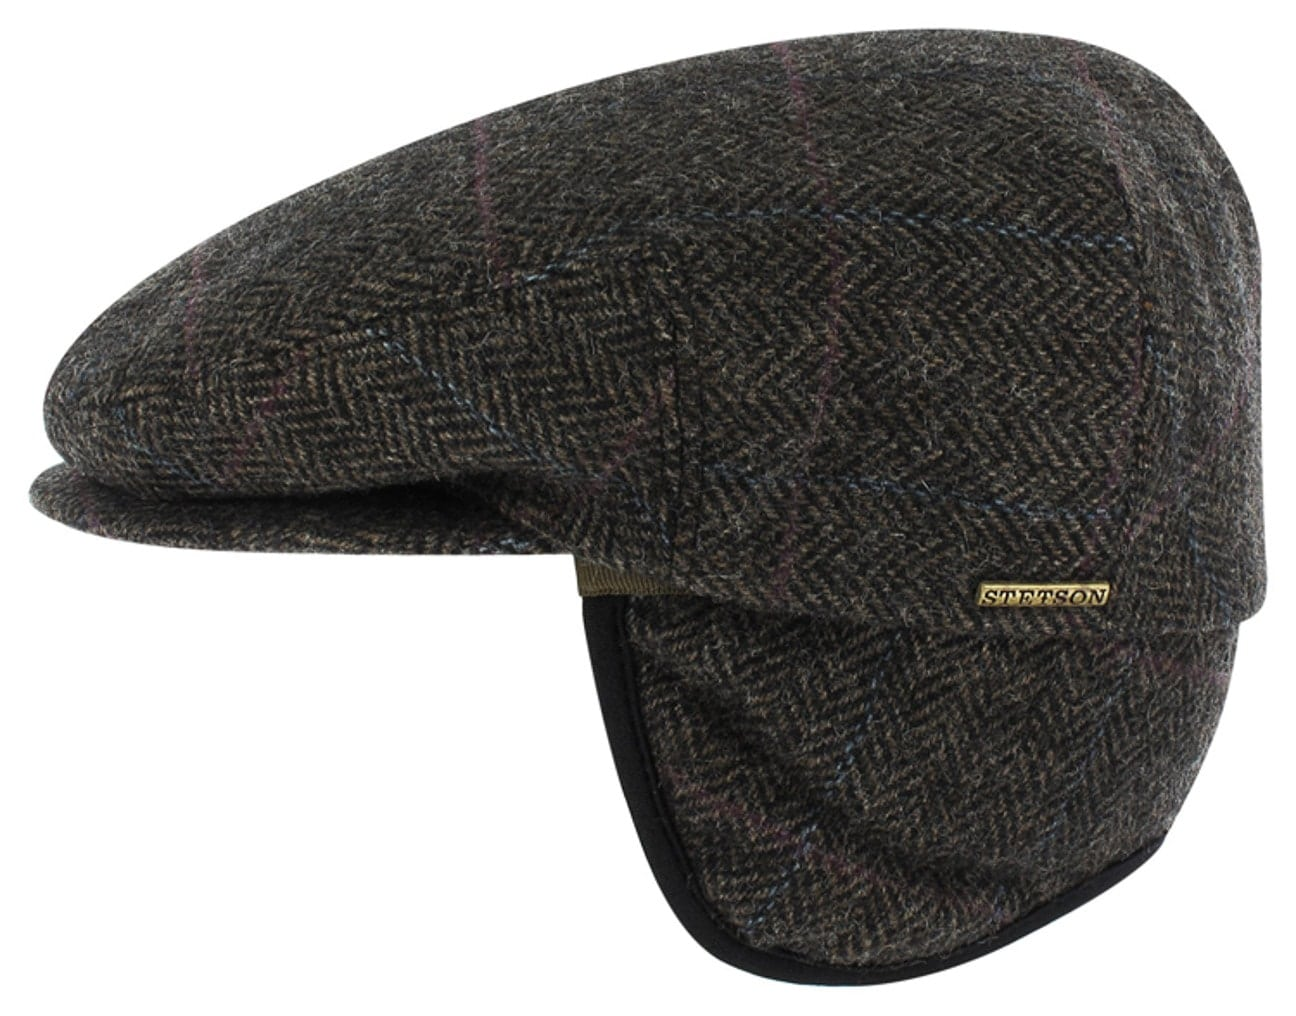 e2341cc8f1d54 Gorra Plana con Orejeras Kent by Stetson - Gorras - sombreroshop.es